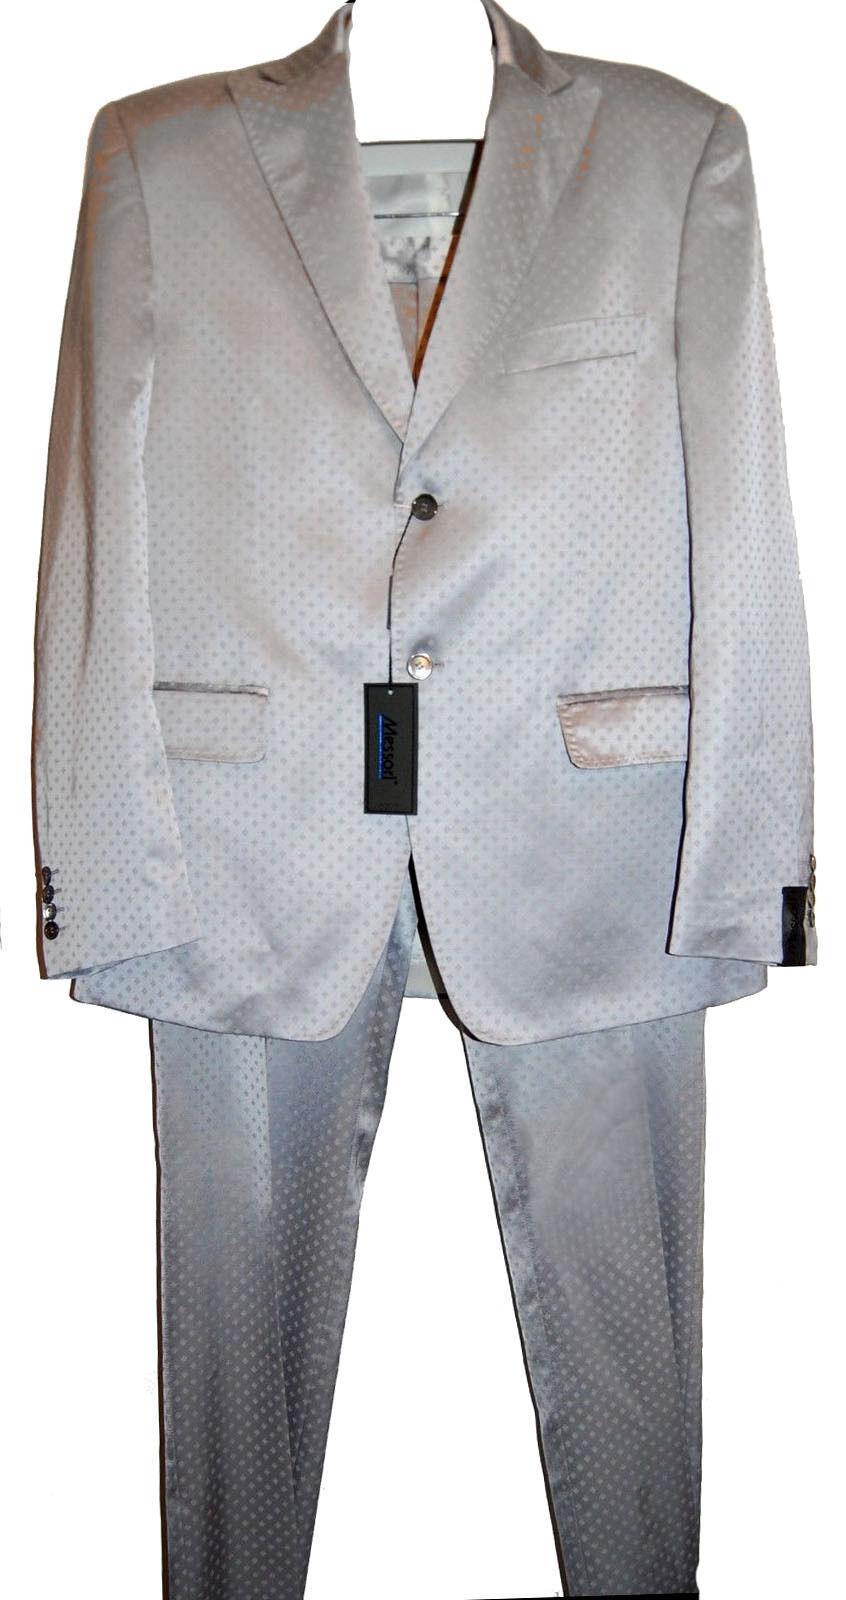 Messori Light grau Satin  Herren Dress Suit Blazer Pants  Größe US 46 EU 56 NEW